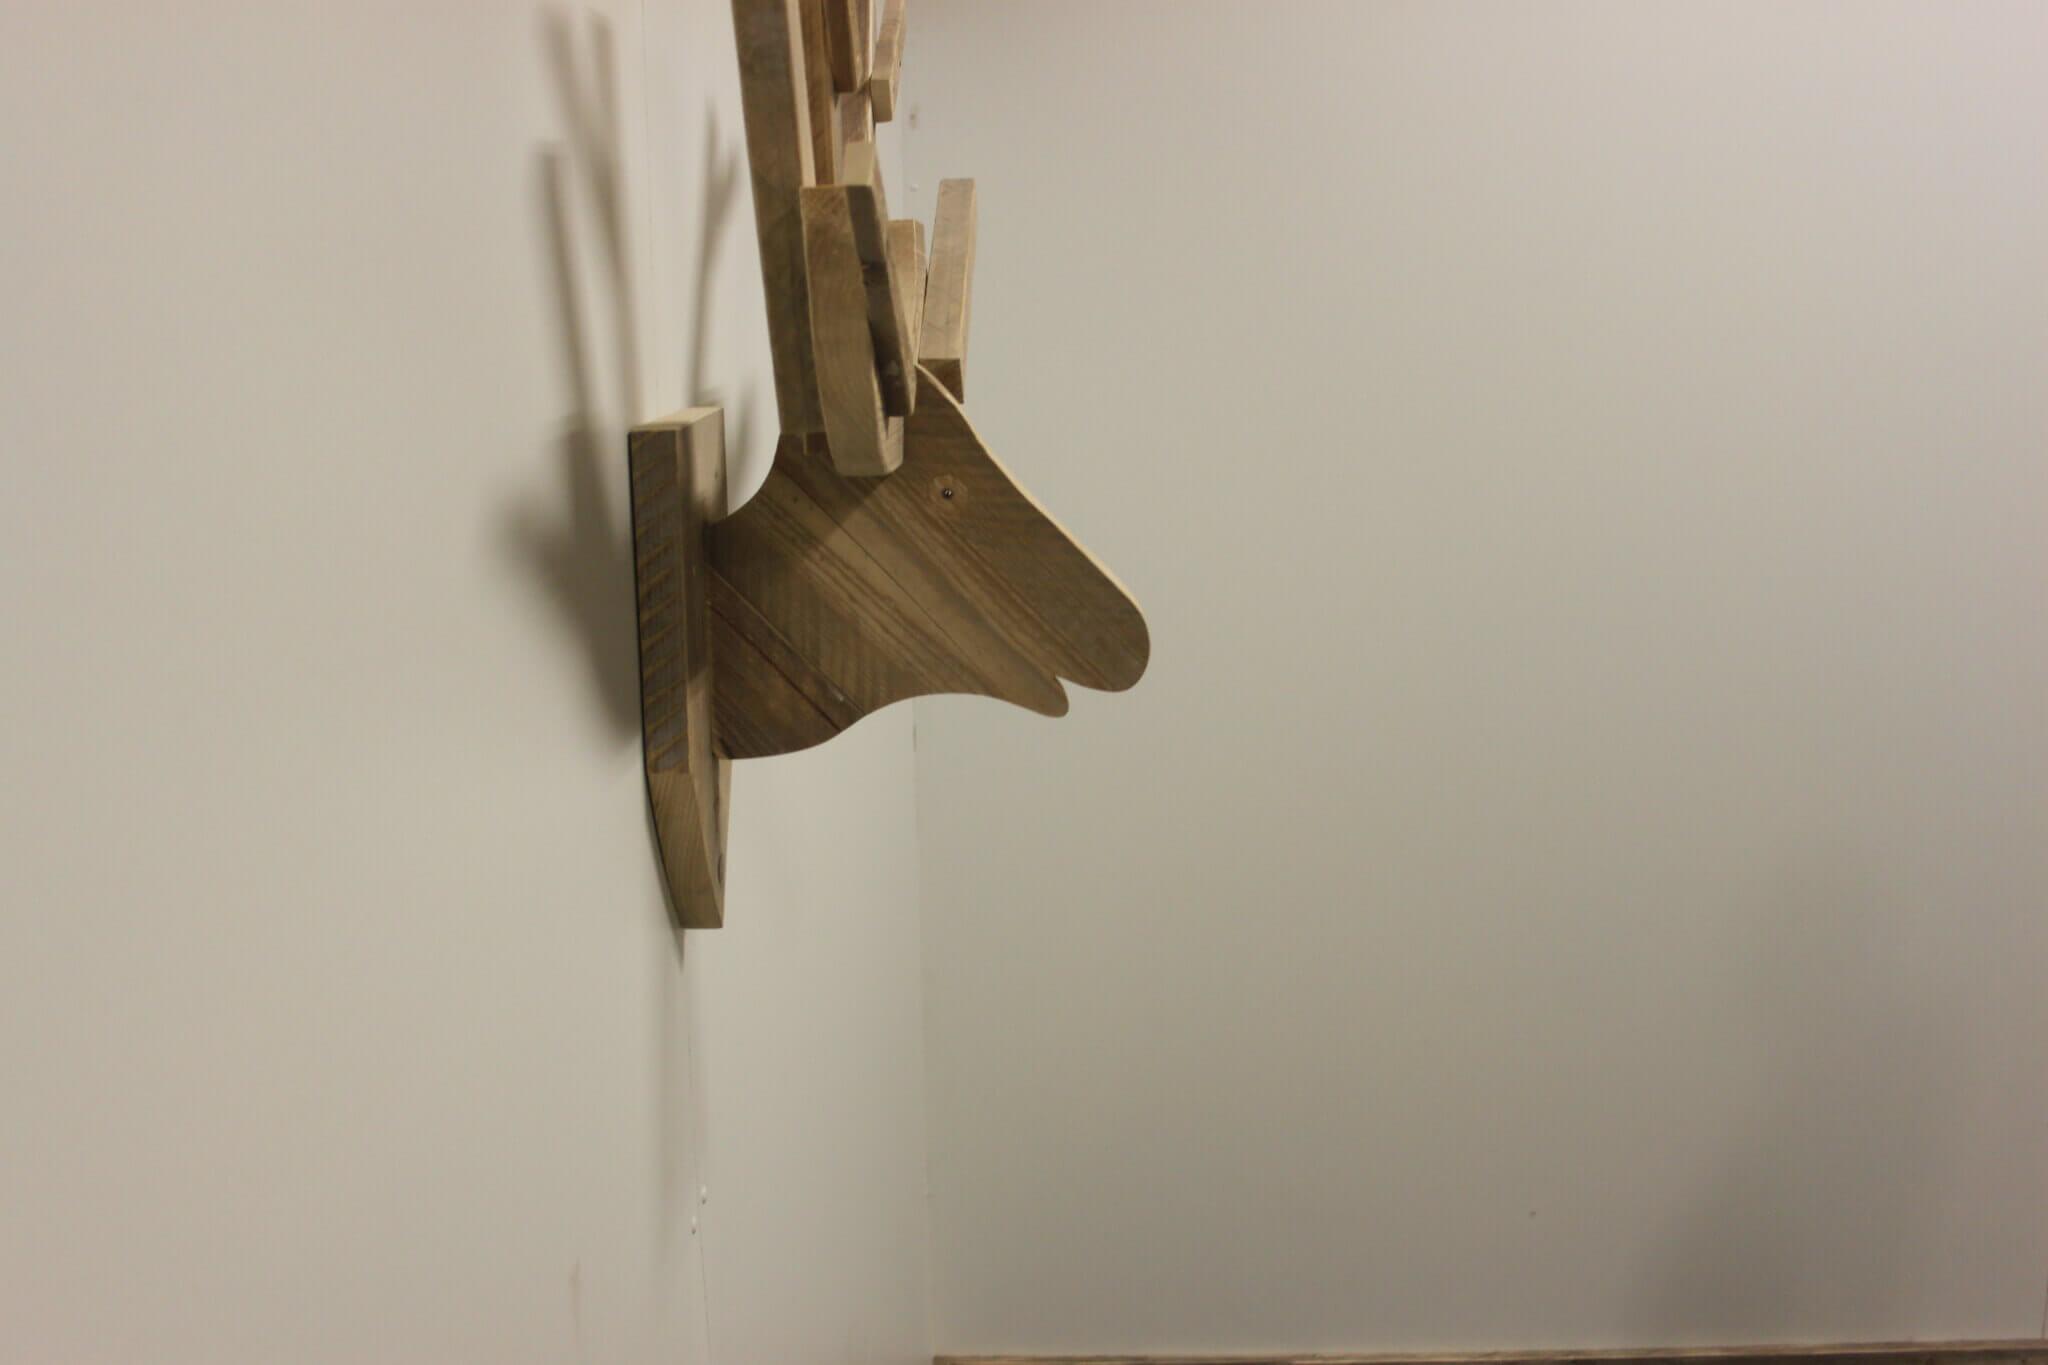 Steigerhouten muur slaapkamer ~ [Spscents.com]